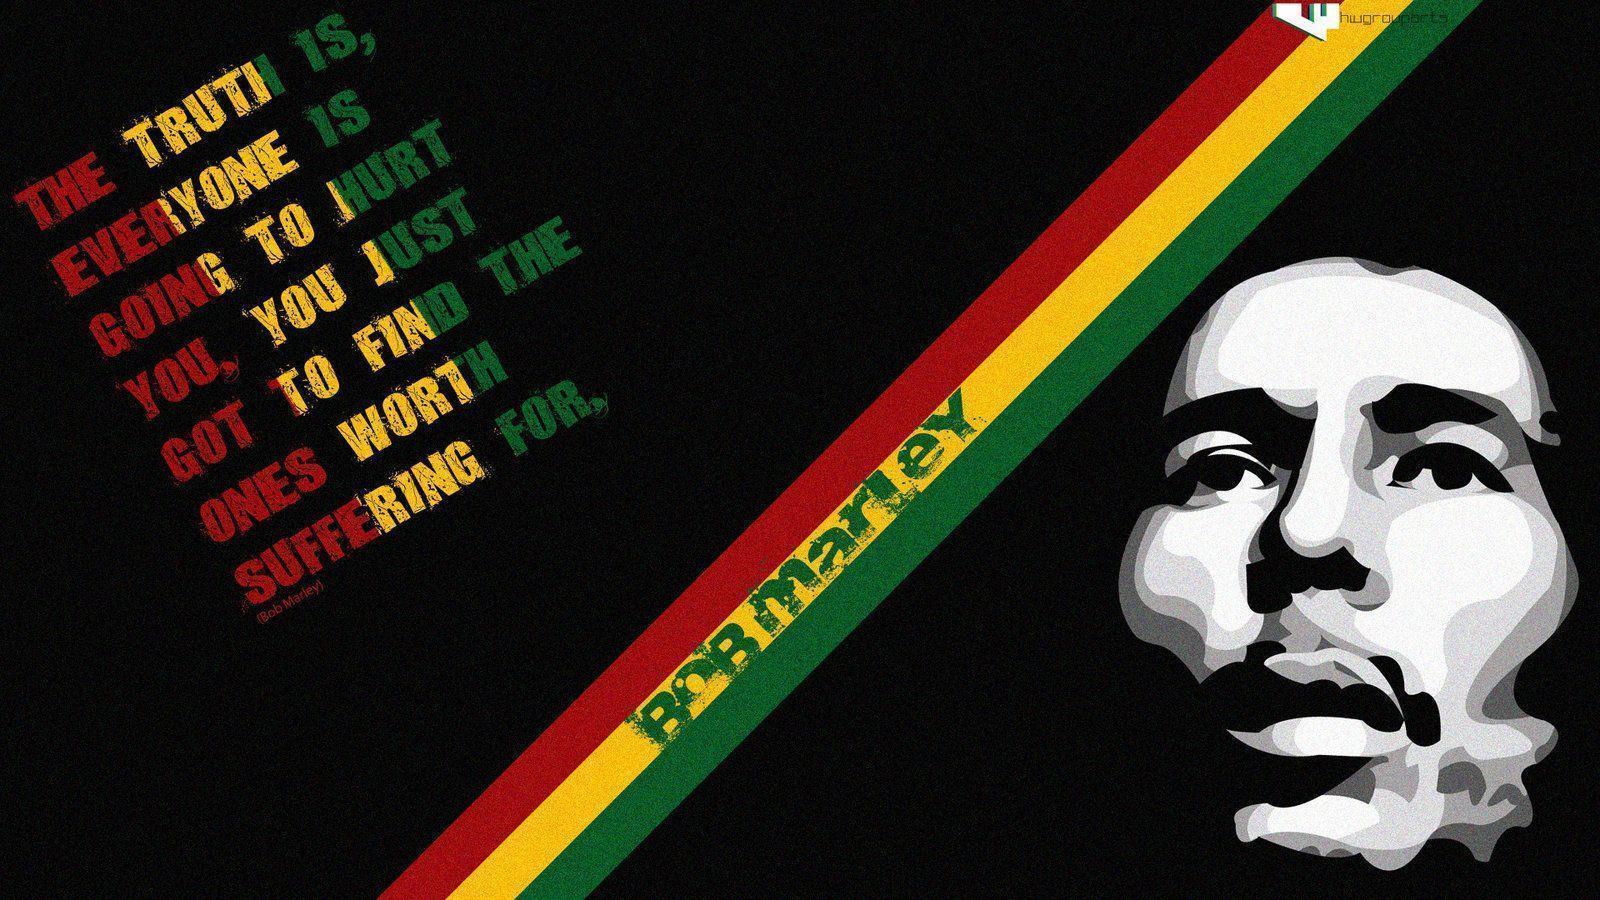 Bob Marley Quotes Wallpapers - Wallpaper Cave